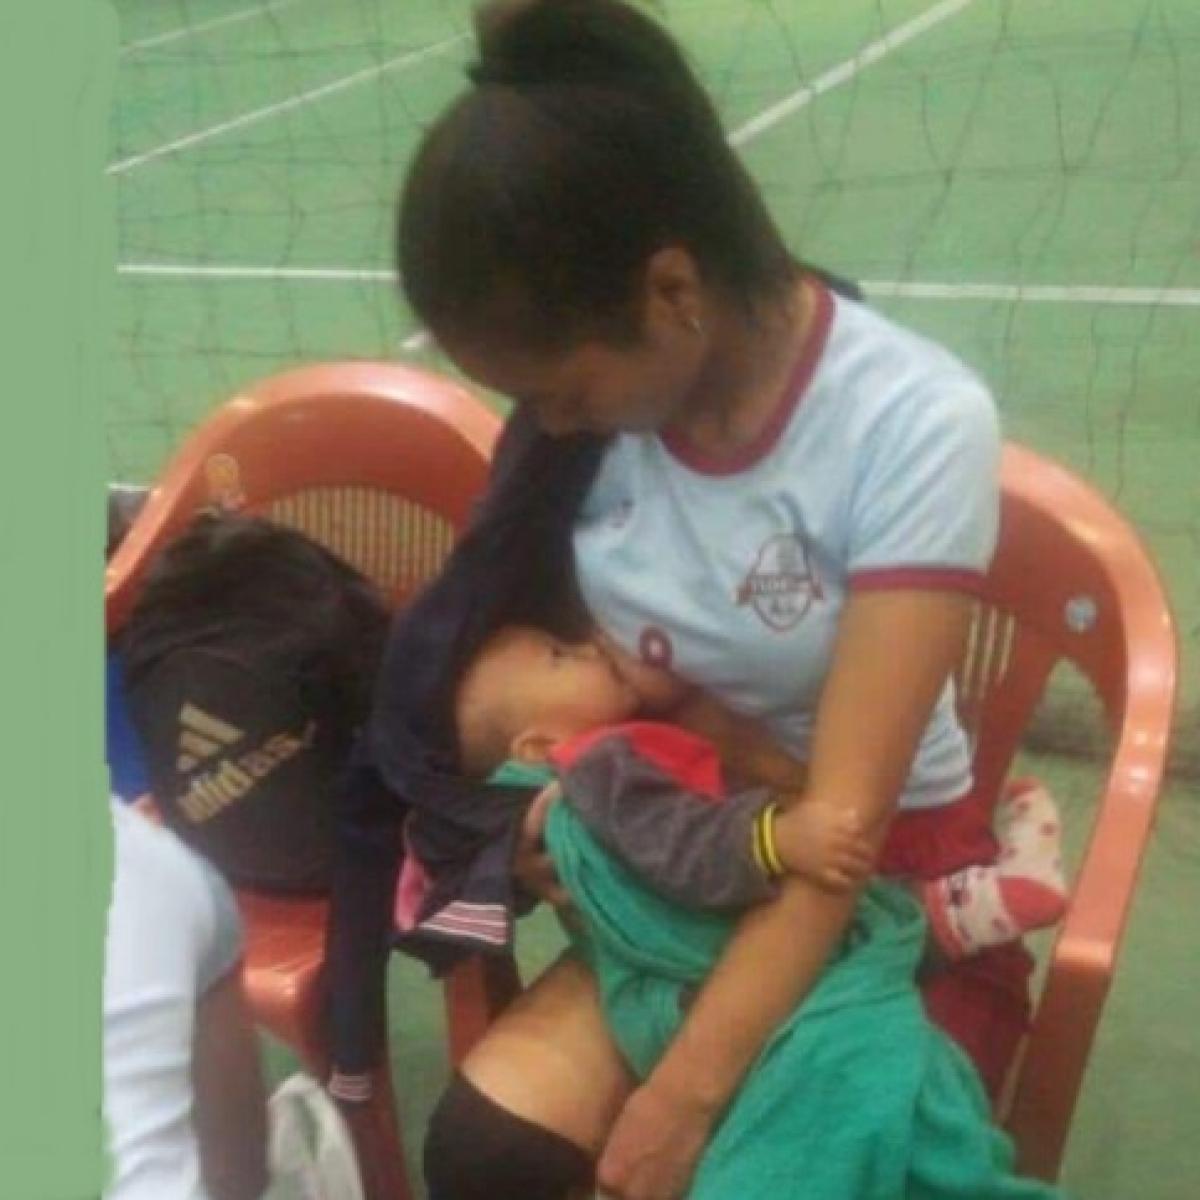 Twitter users praise woman spiker breastfeeding her baby